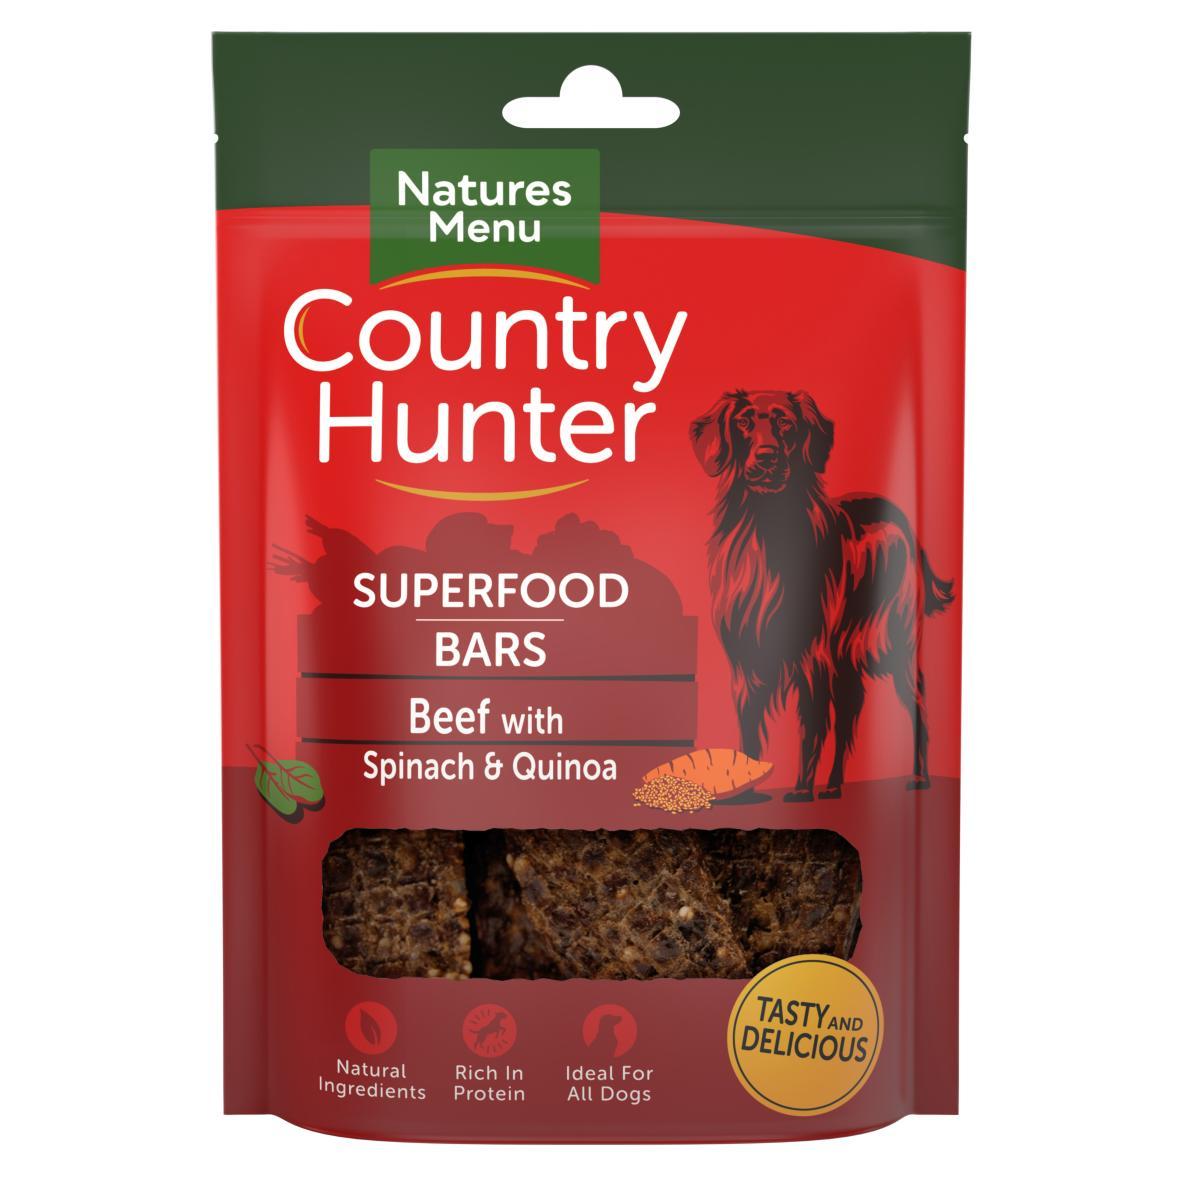 Natures Menu Country Hunter Superfood Bars Beef 100gm